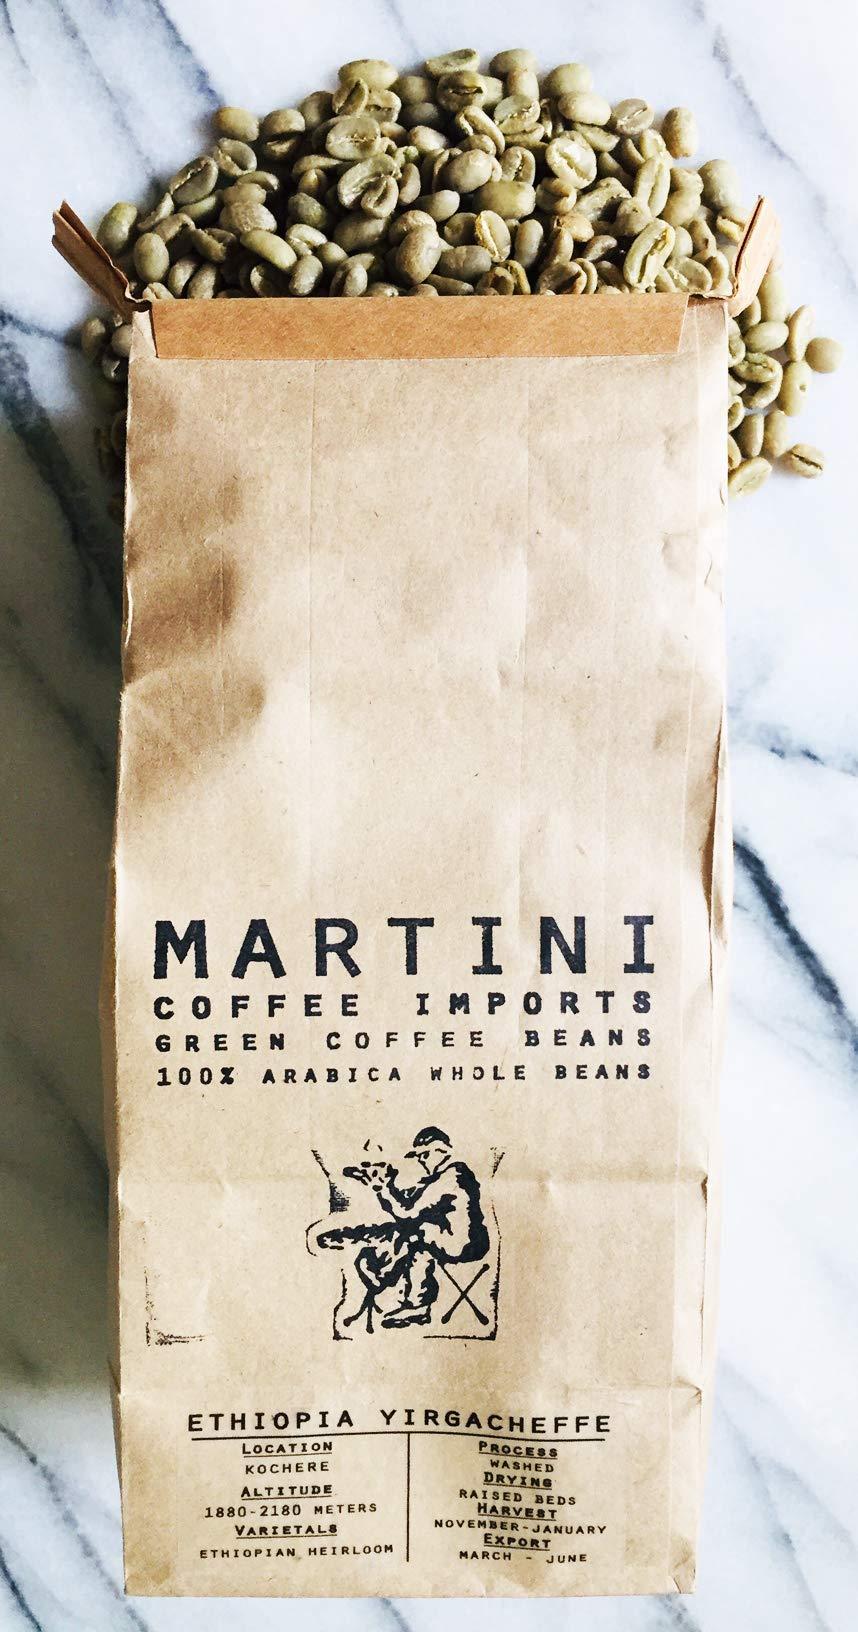 3LBS - Unroasted Green Coffee Beans - Single Origin - Ethiopia Yirgacheffe -100% Raw Green Arabica Coffee Beans - ( Yirgacheffe Region, Ethiopia, Africa) by Martini Coffee Roasters